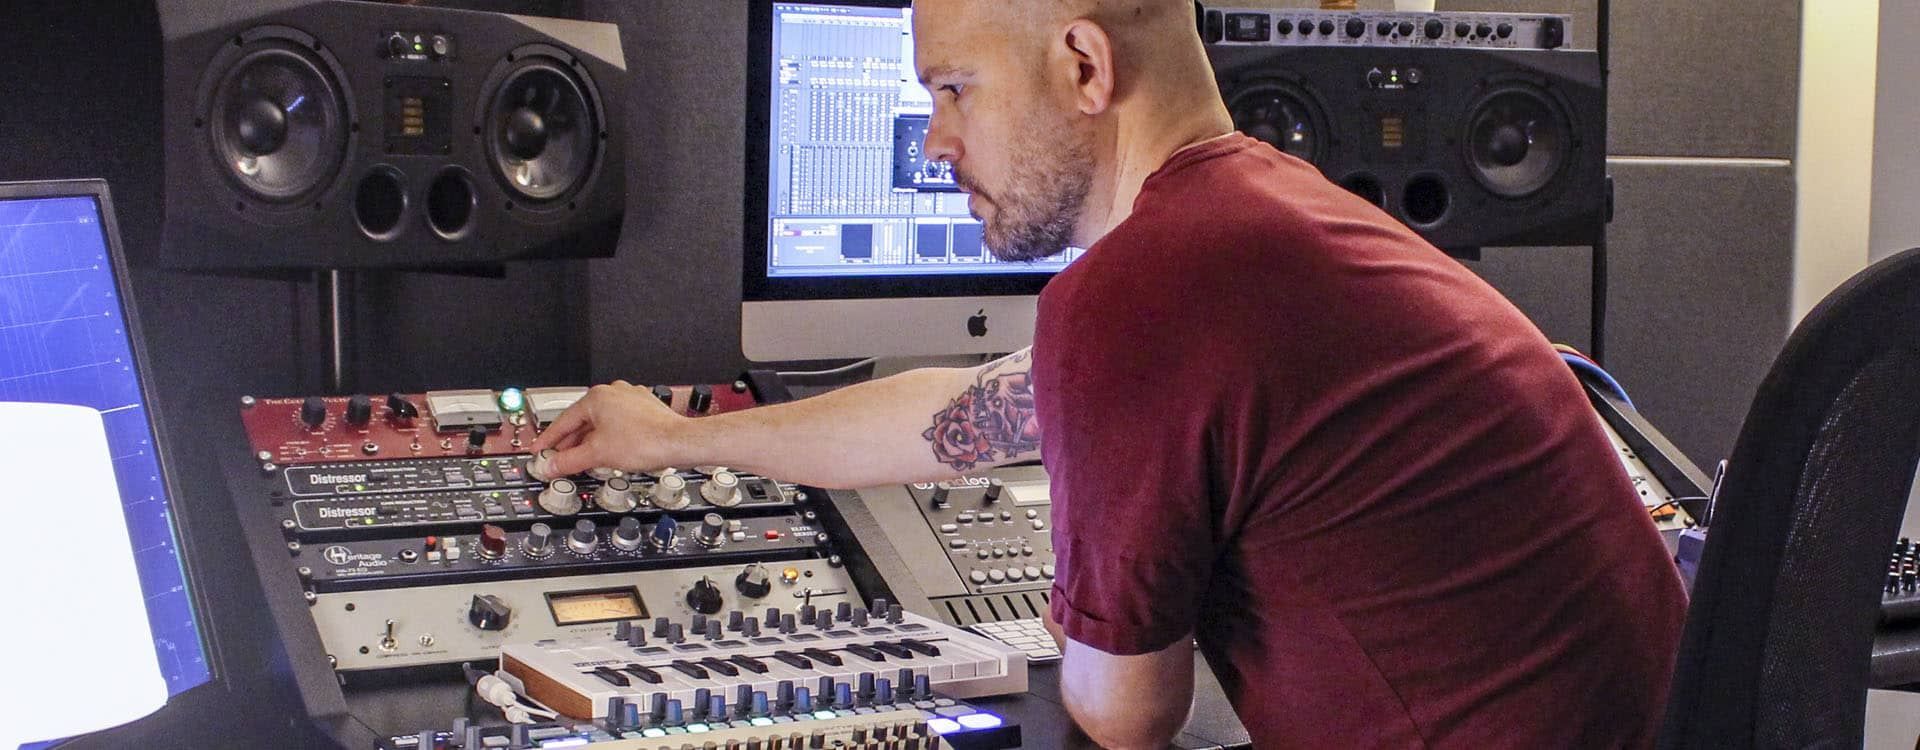 Curso-online-produccion-mezcla-master-house